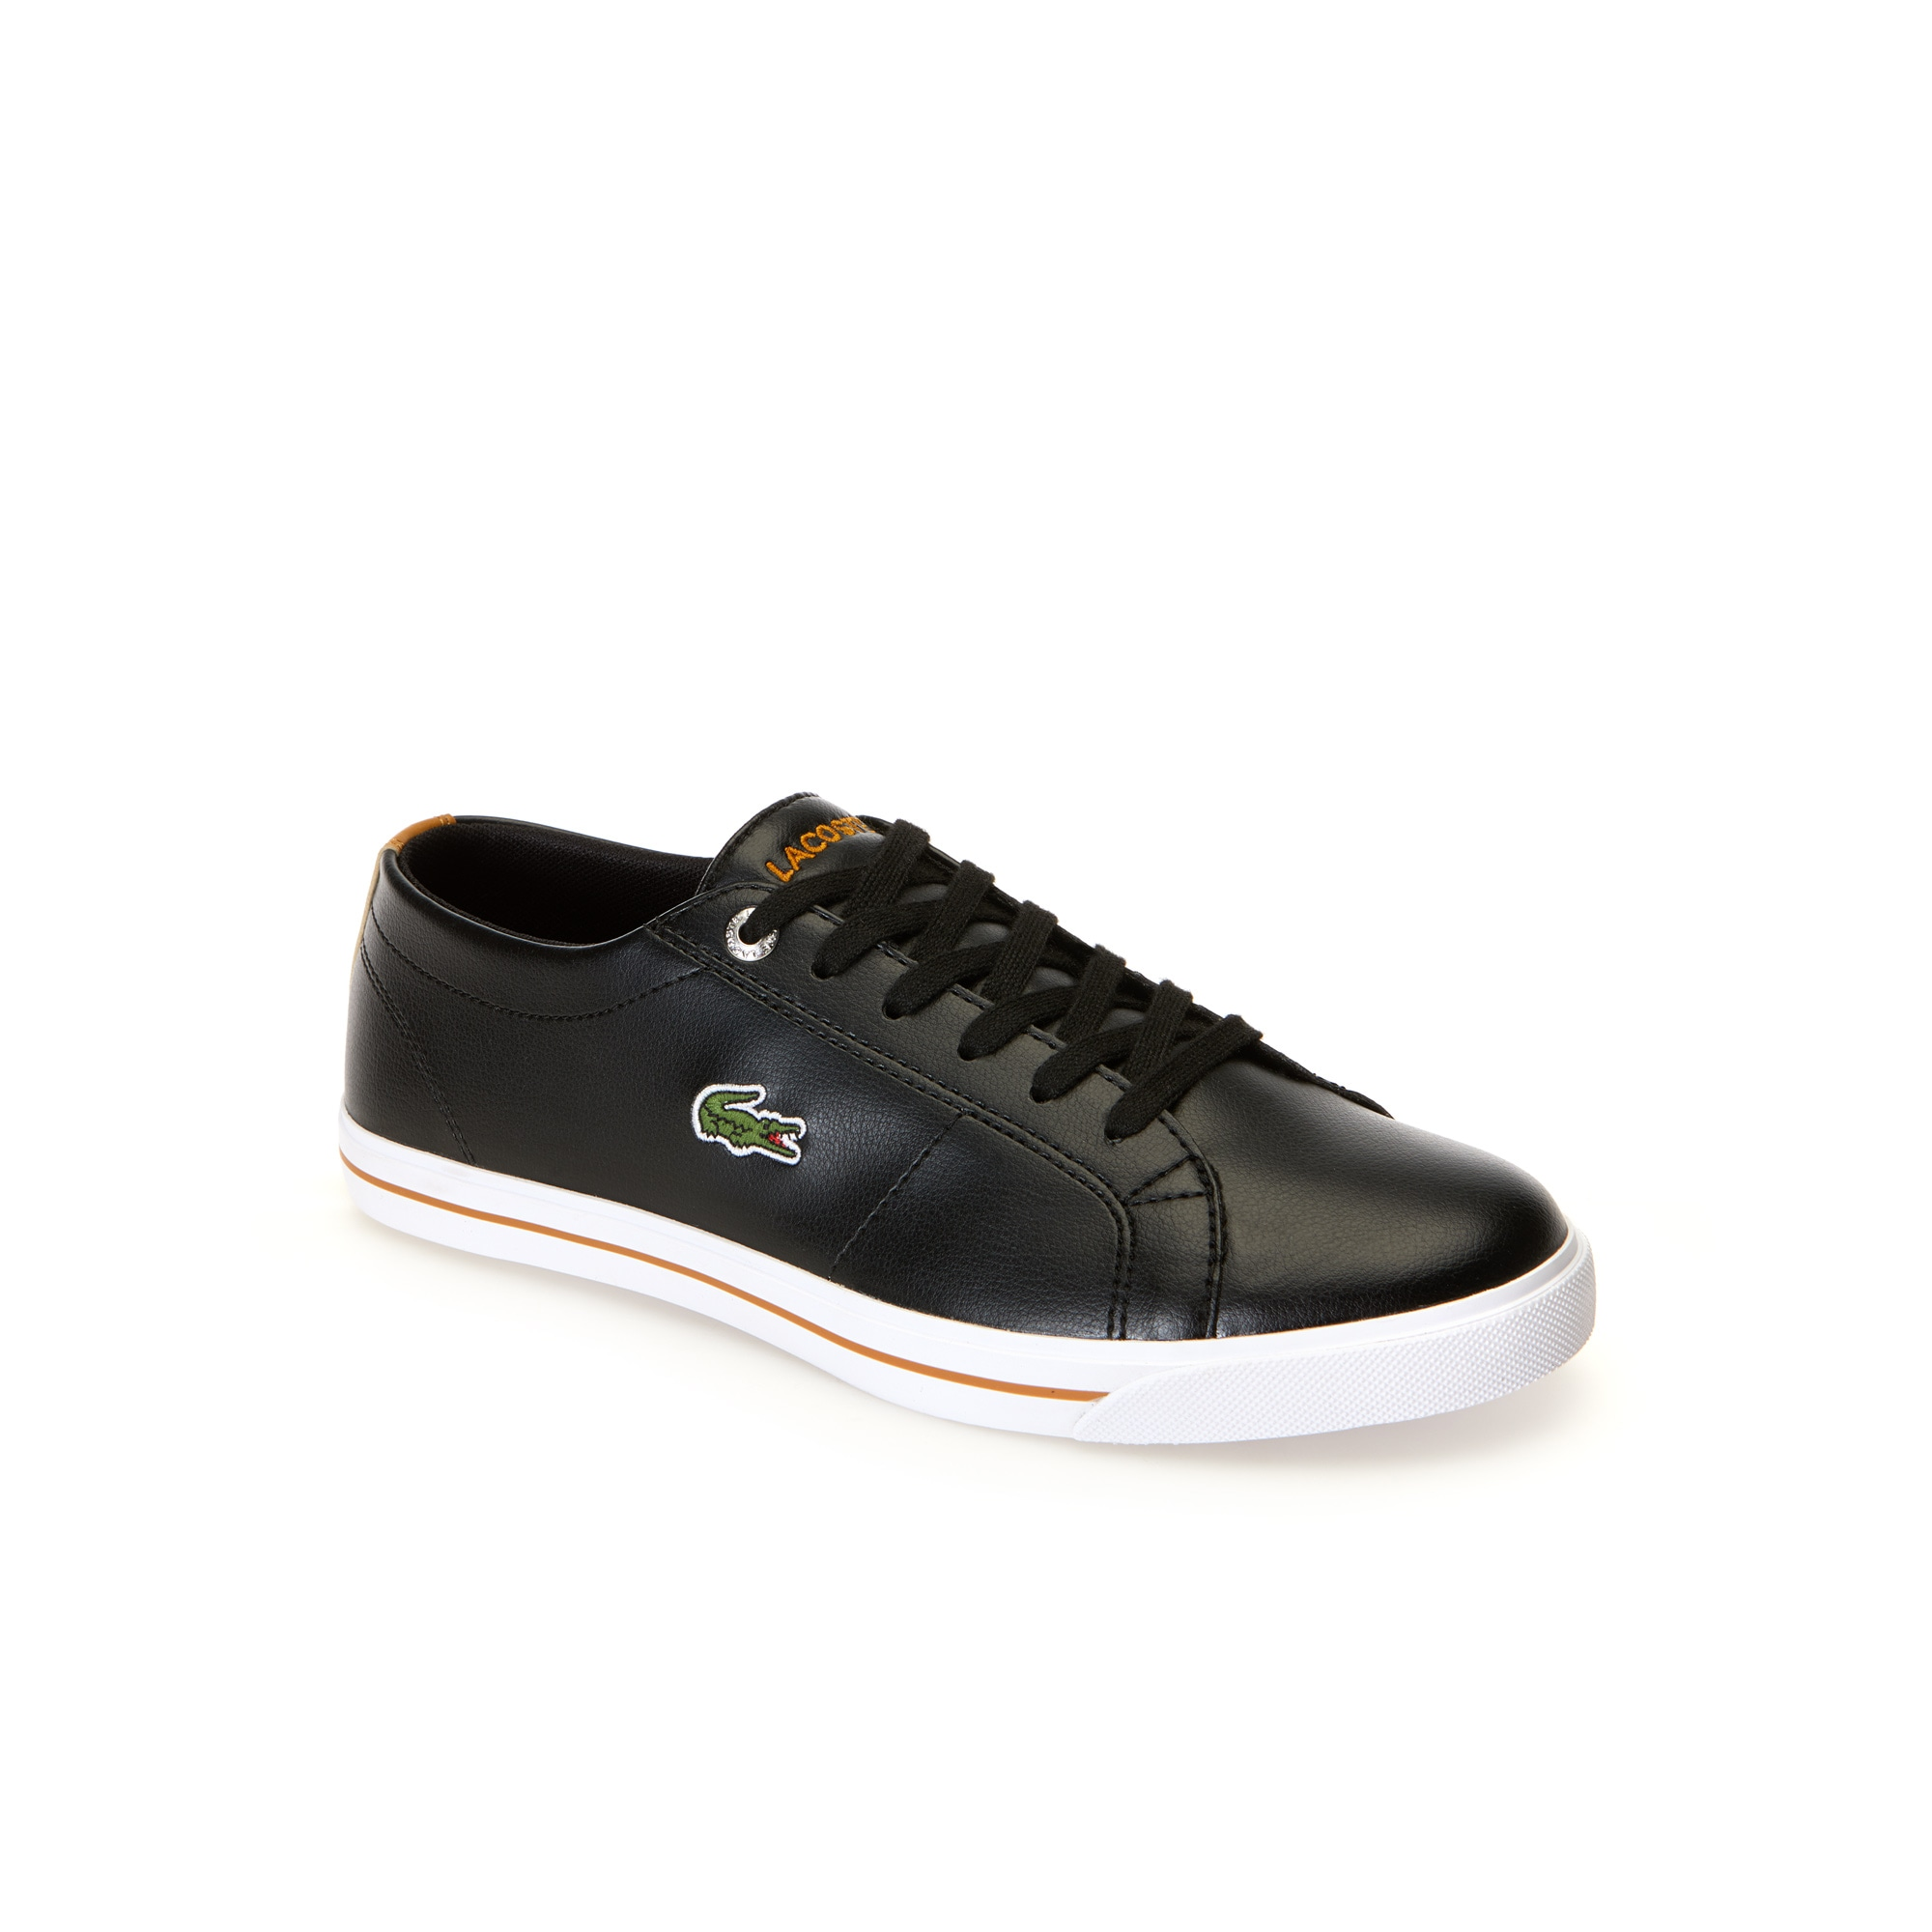 Teen-Sneakers RIBERAC aus Textil